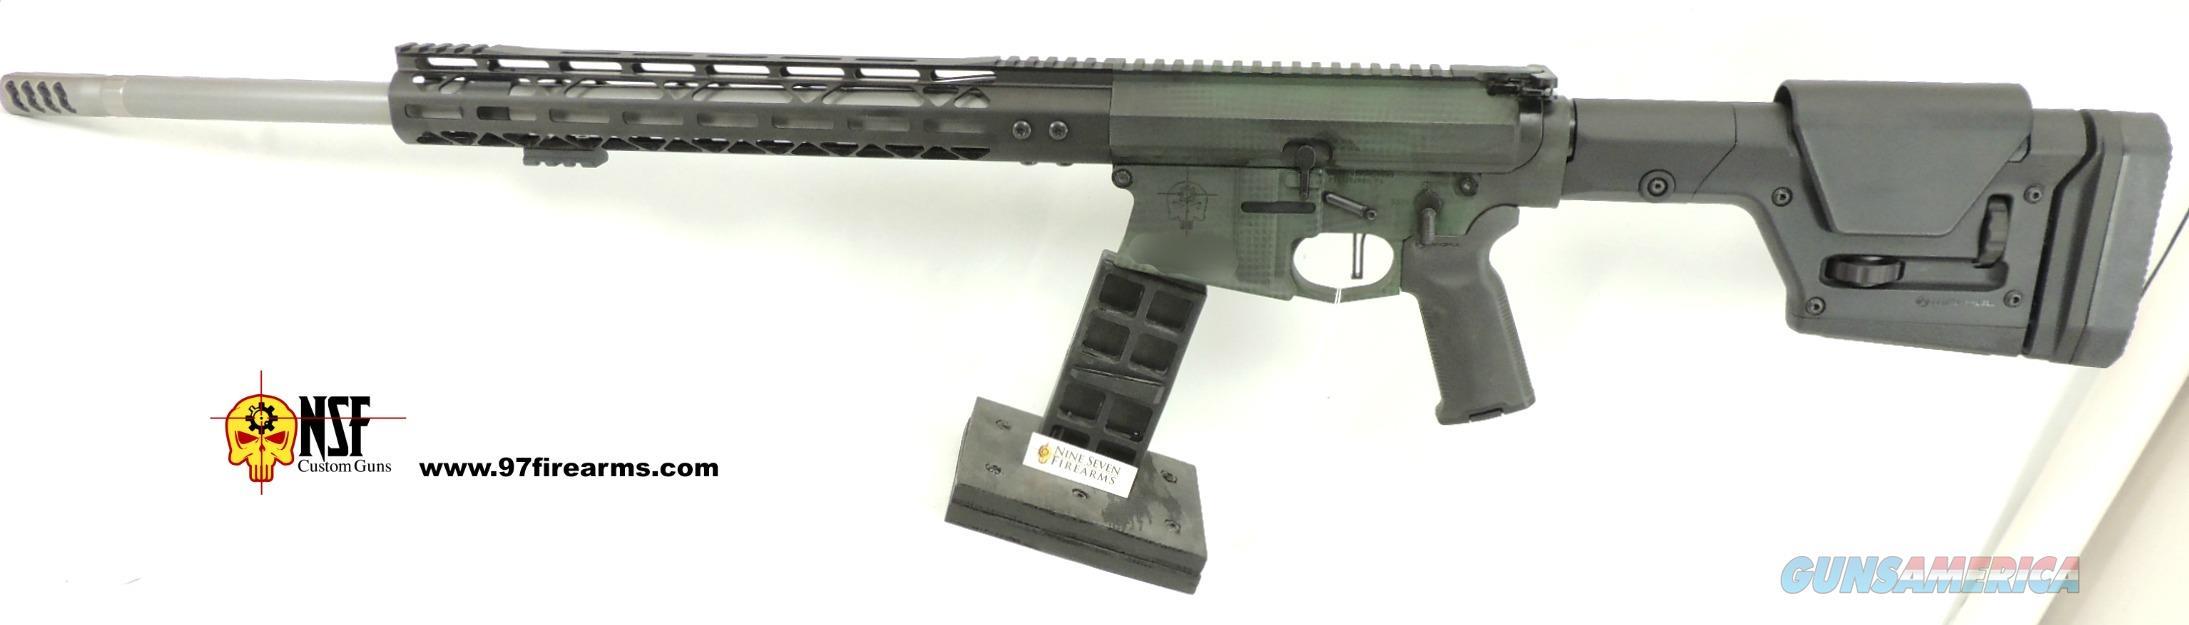 "6.5 Creedmoor, 22"" Heavy Barrel, Custom Cerakote, POF Trigger, Nickel BCG  Guns > Rifles > AR-15 Rifles - Small Manufacturers > Complete Rifle"